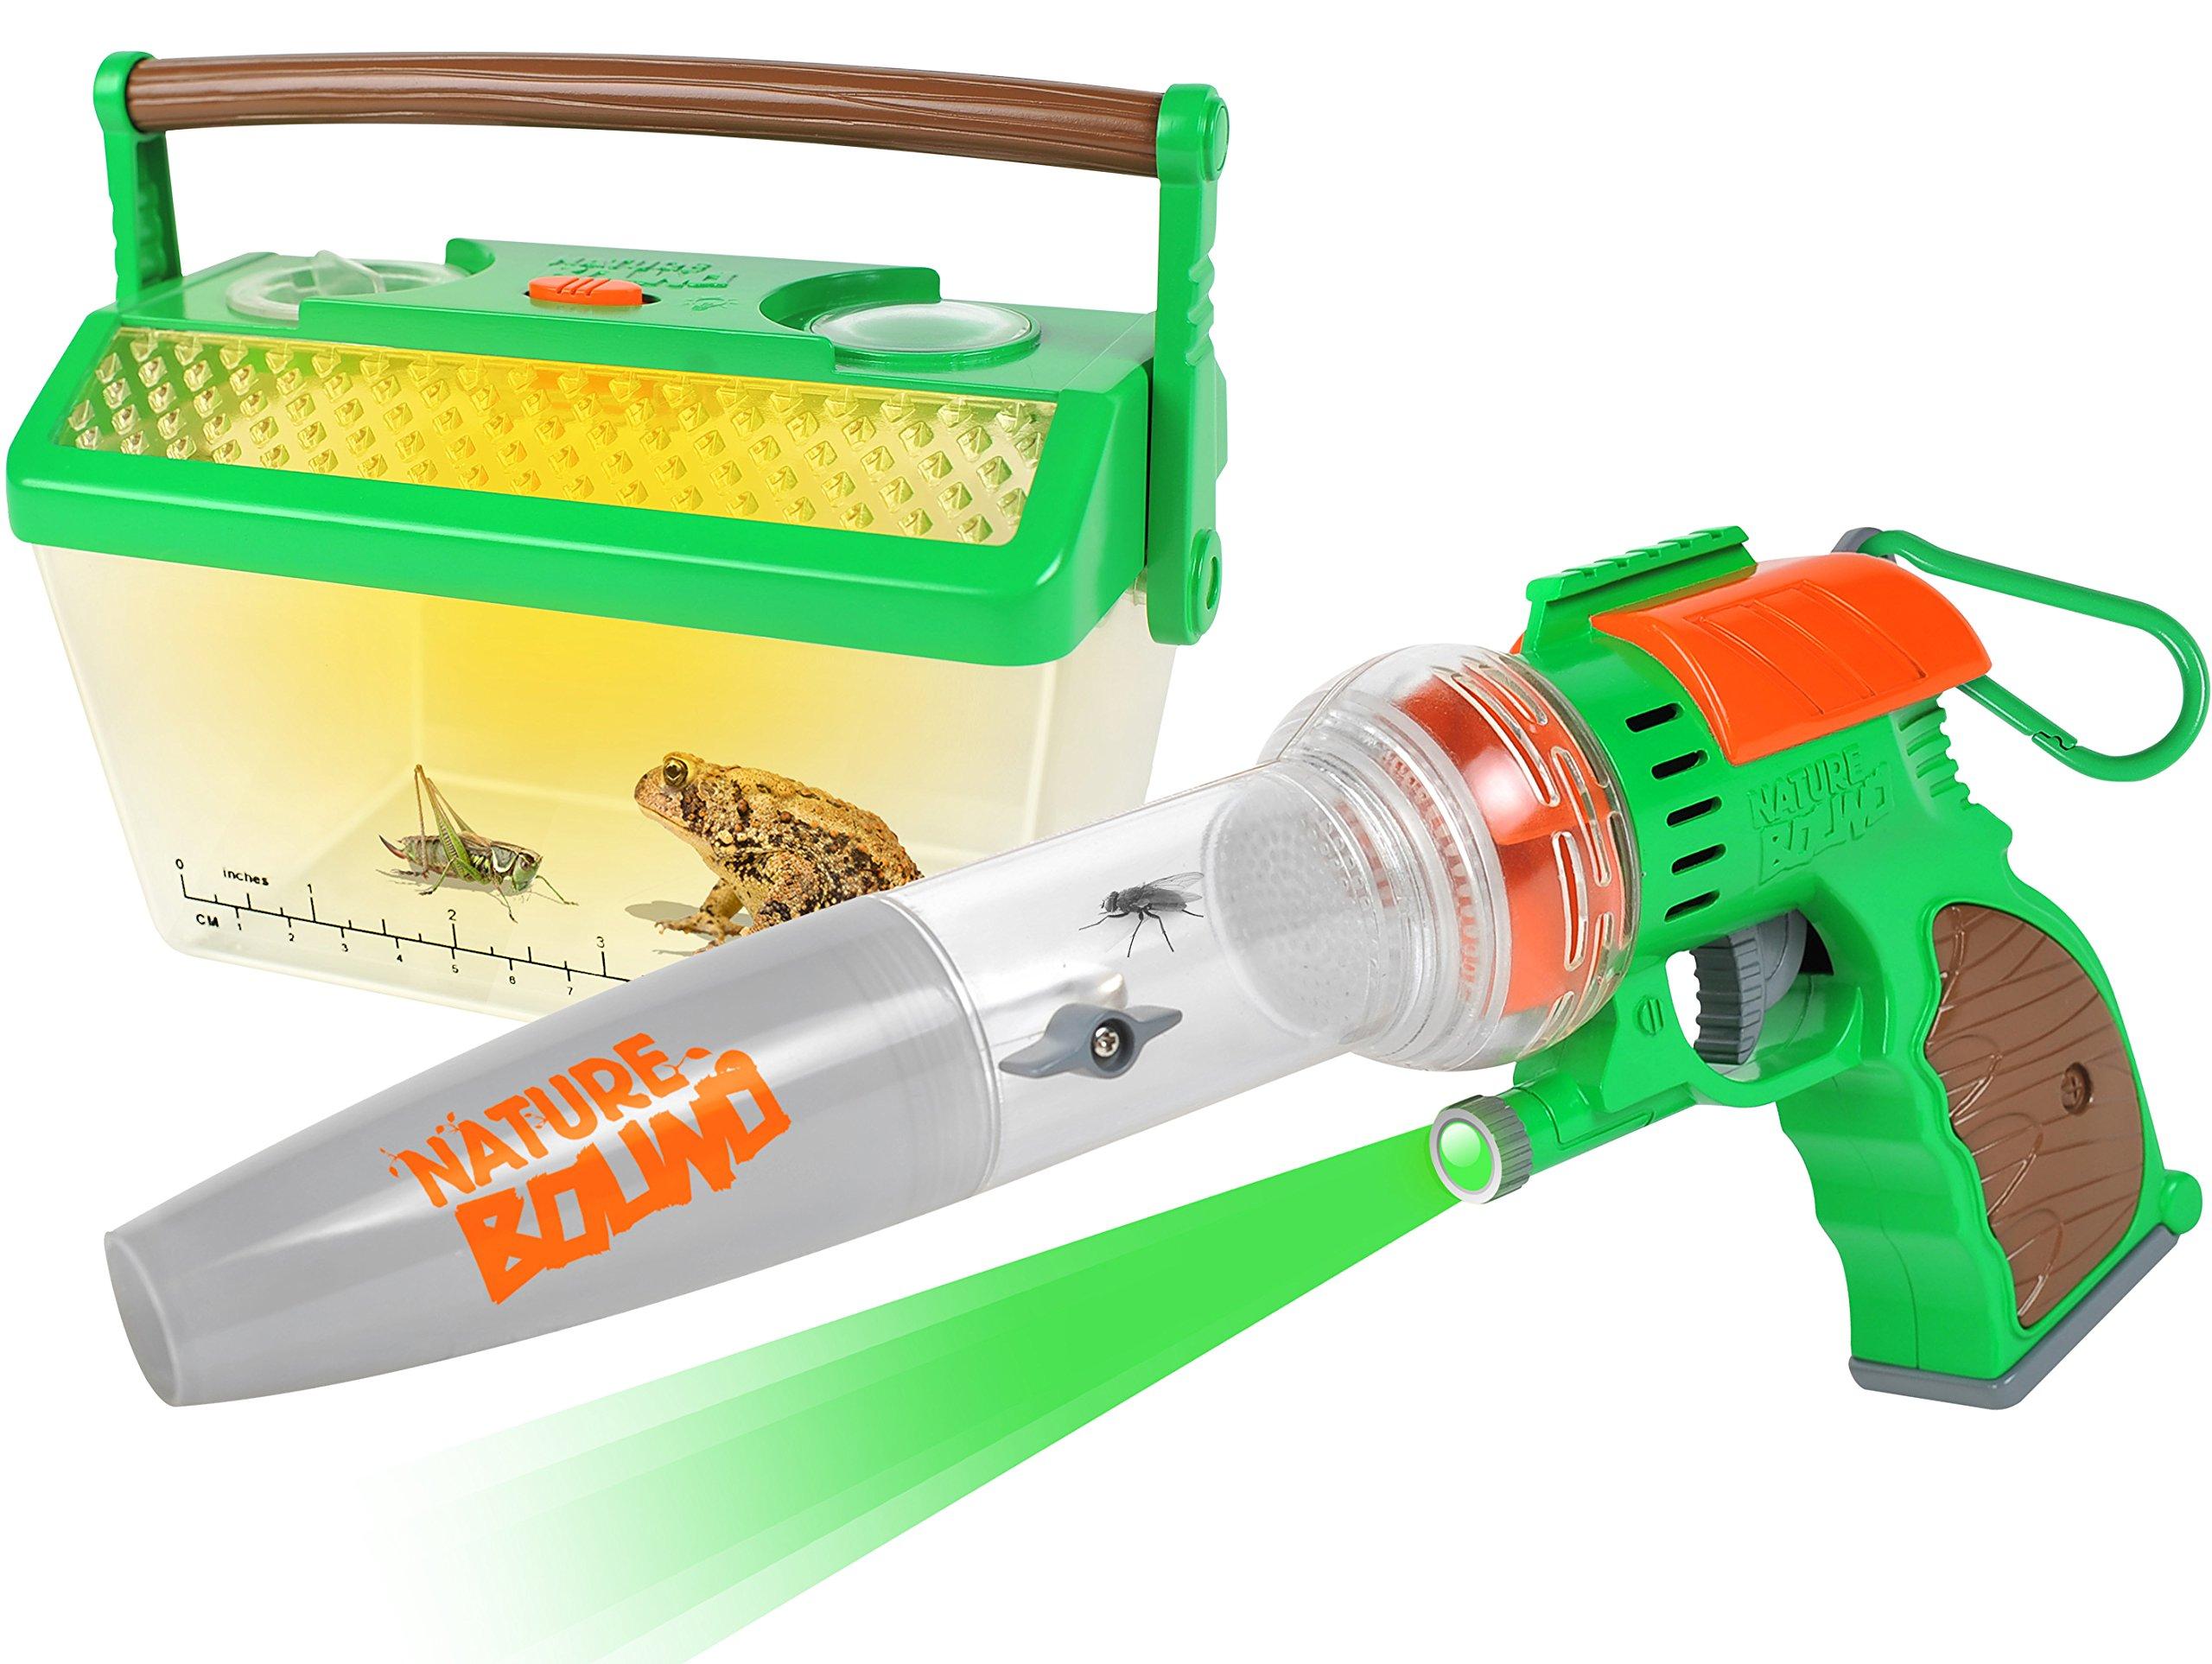 Nature Bound Bug Catcher Vacuum with Light Up Critter Habitat Case for Backyard Exploration - Complete kit for Kids